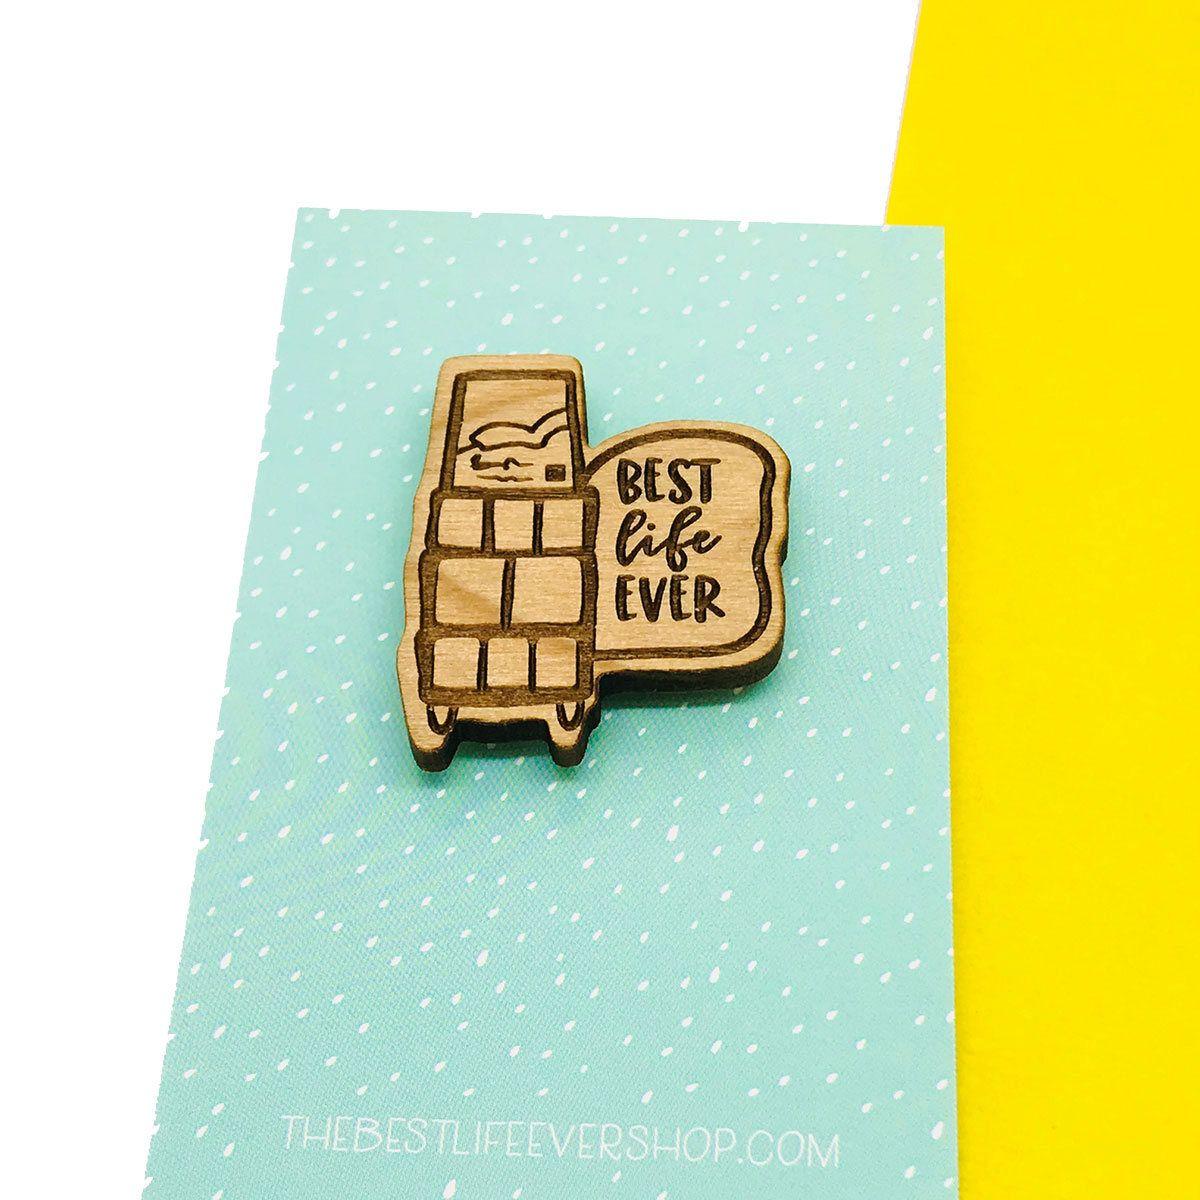 efeb59ec47e7 Laser Engraved Wooden Lapel Pin - Best Life Ever Cart jw gifts - jw  ministry -